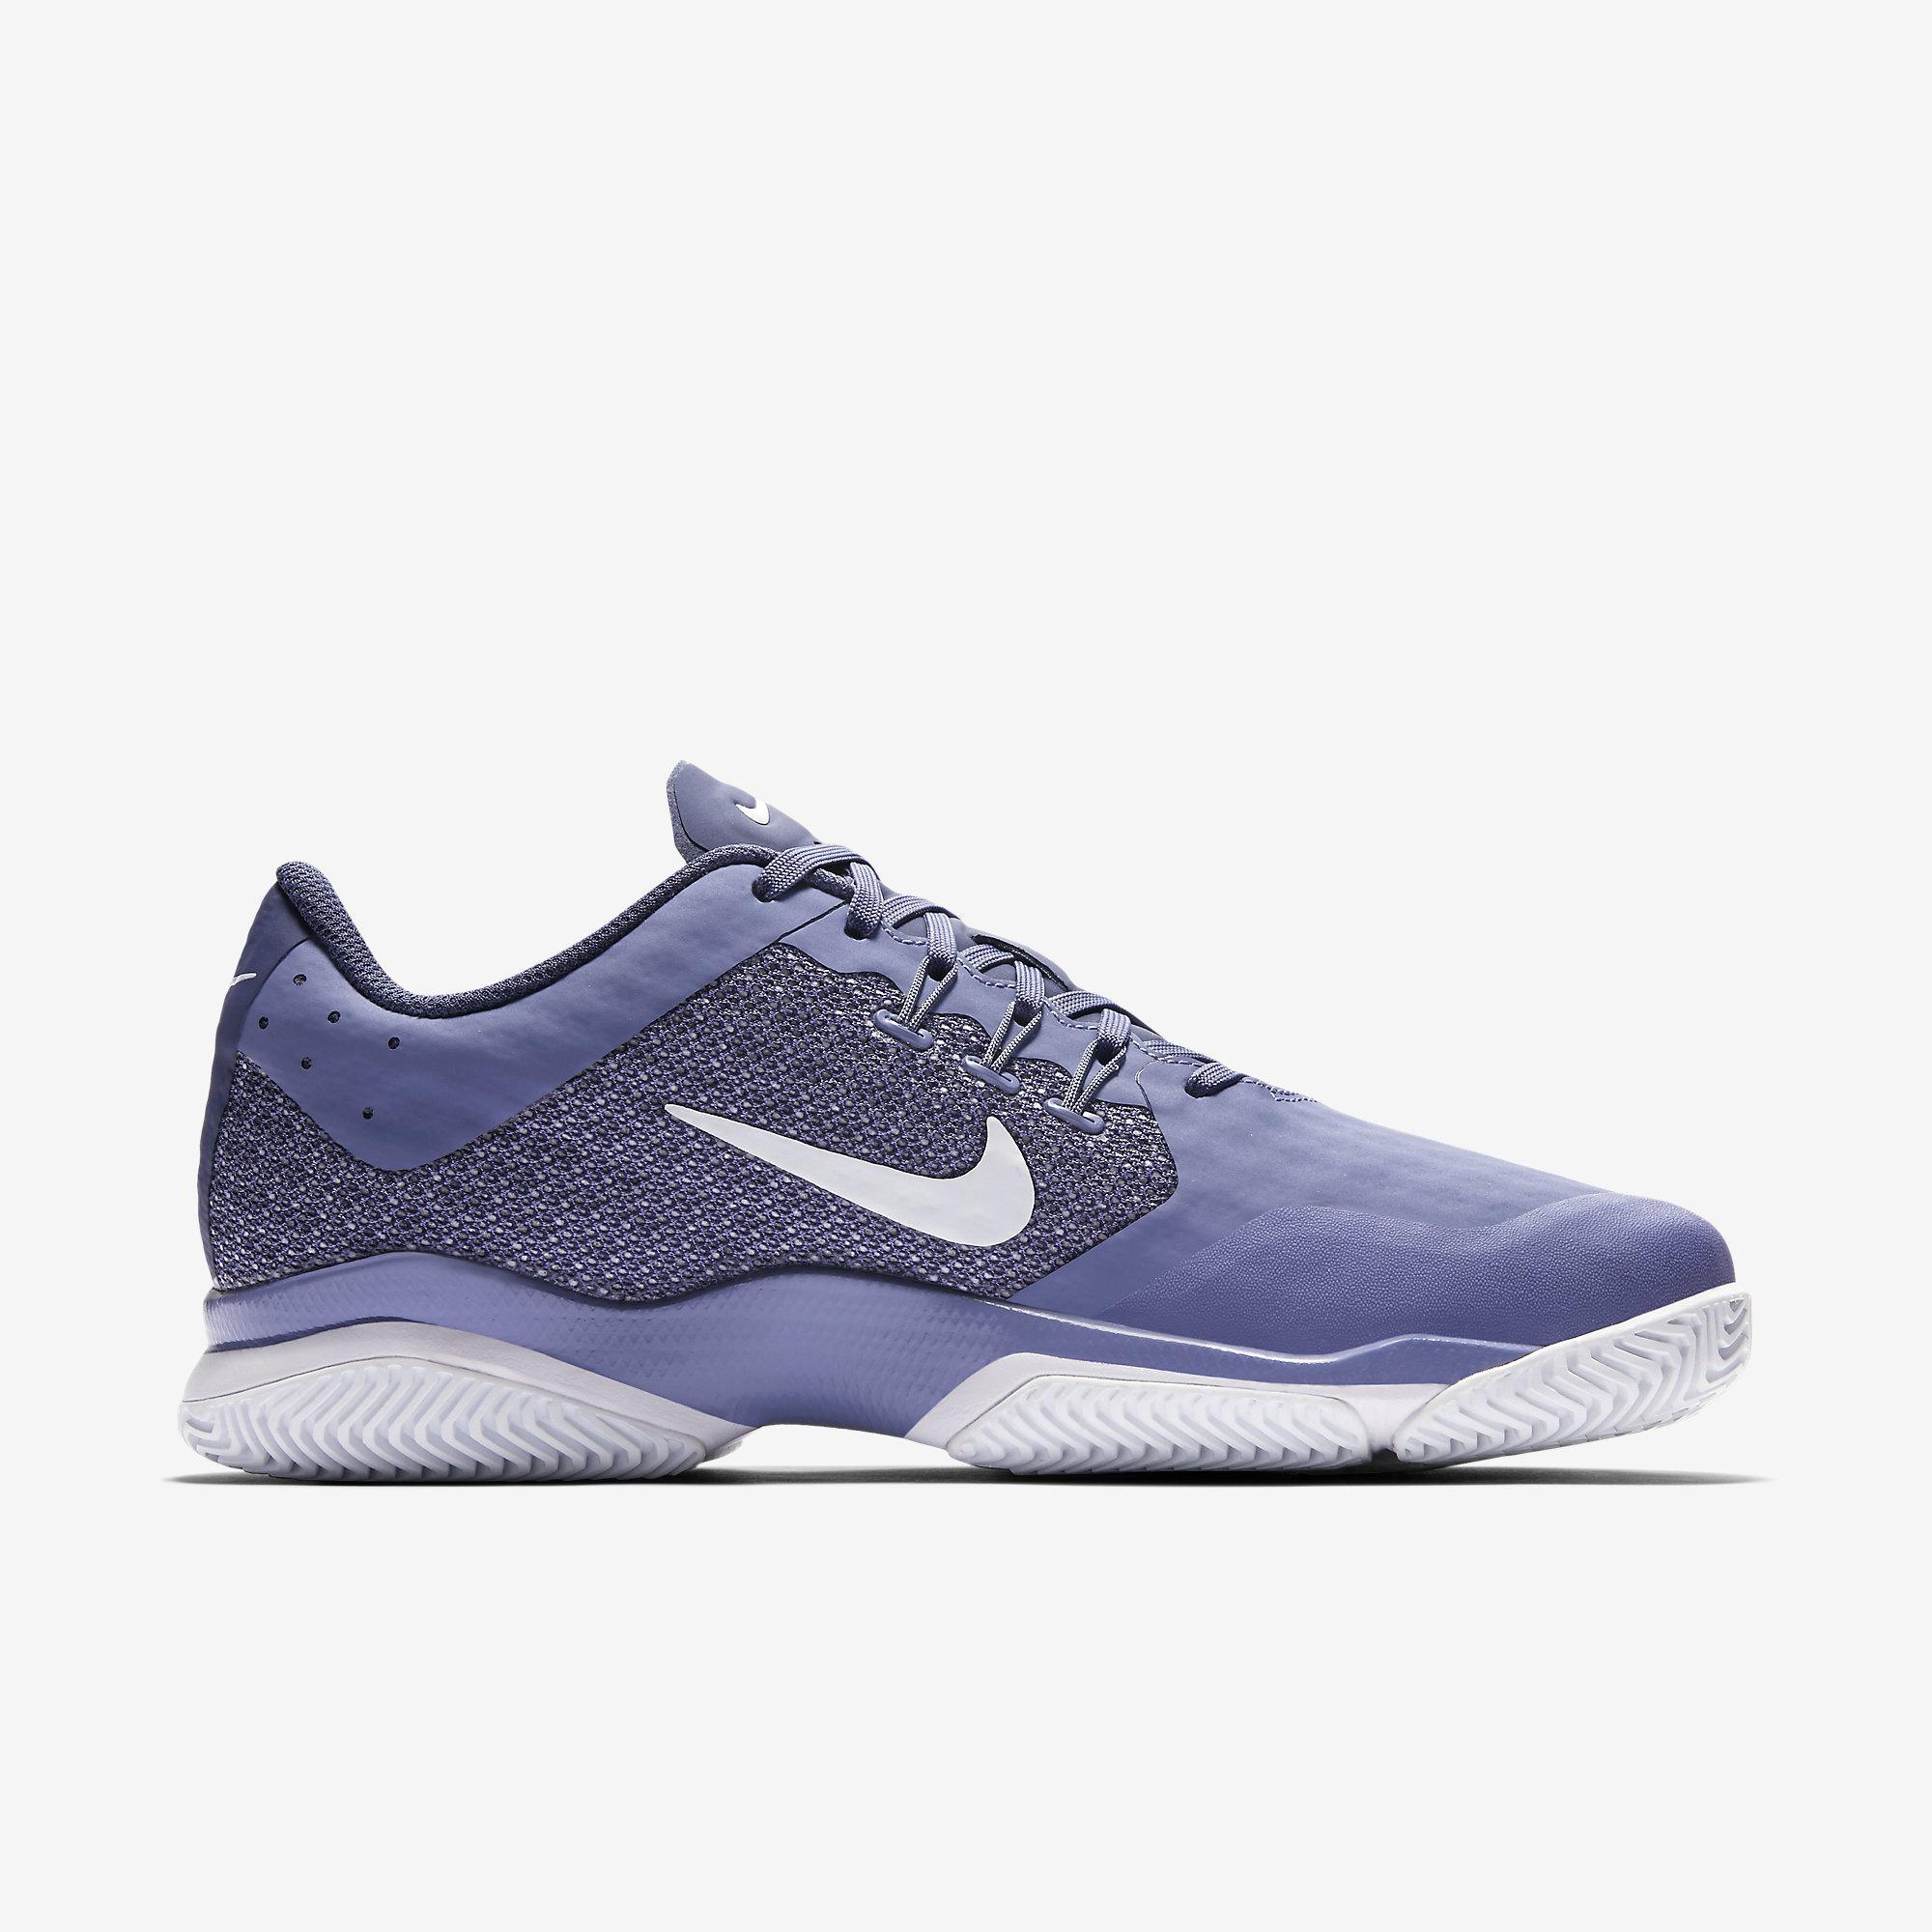 Nike tennis shoes women purple